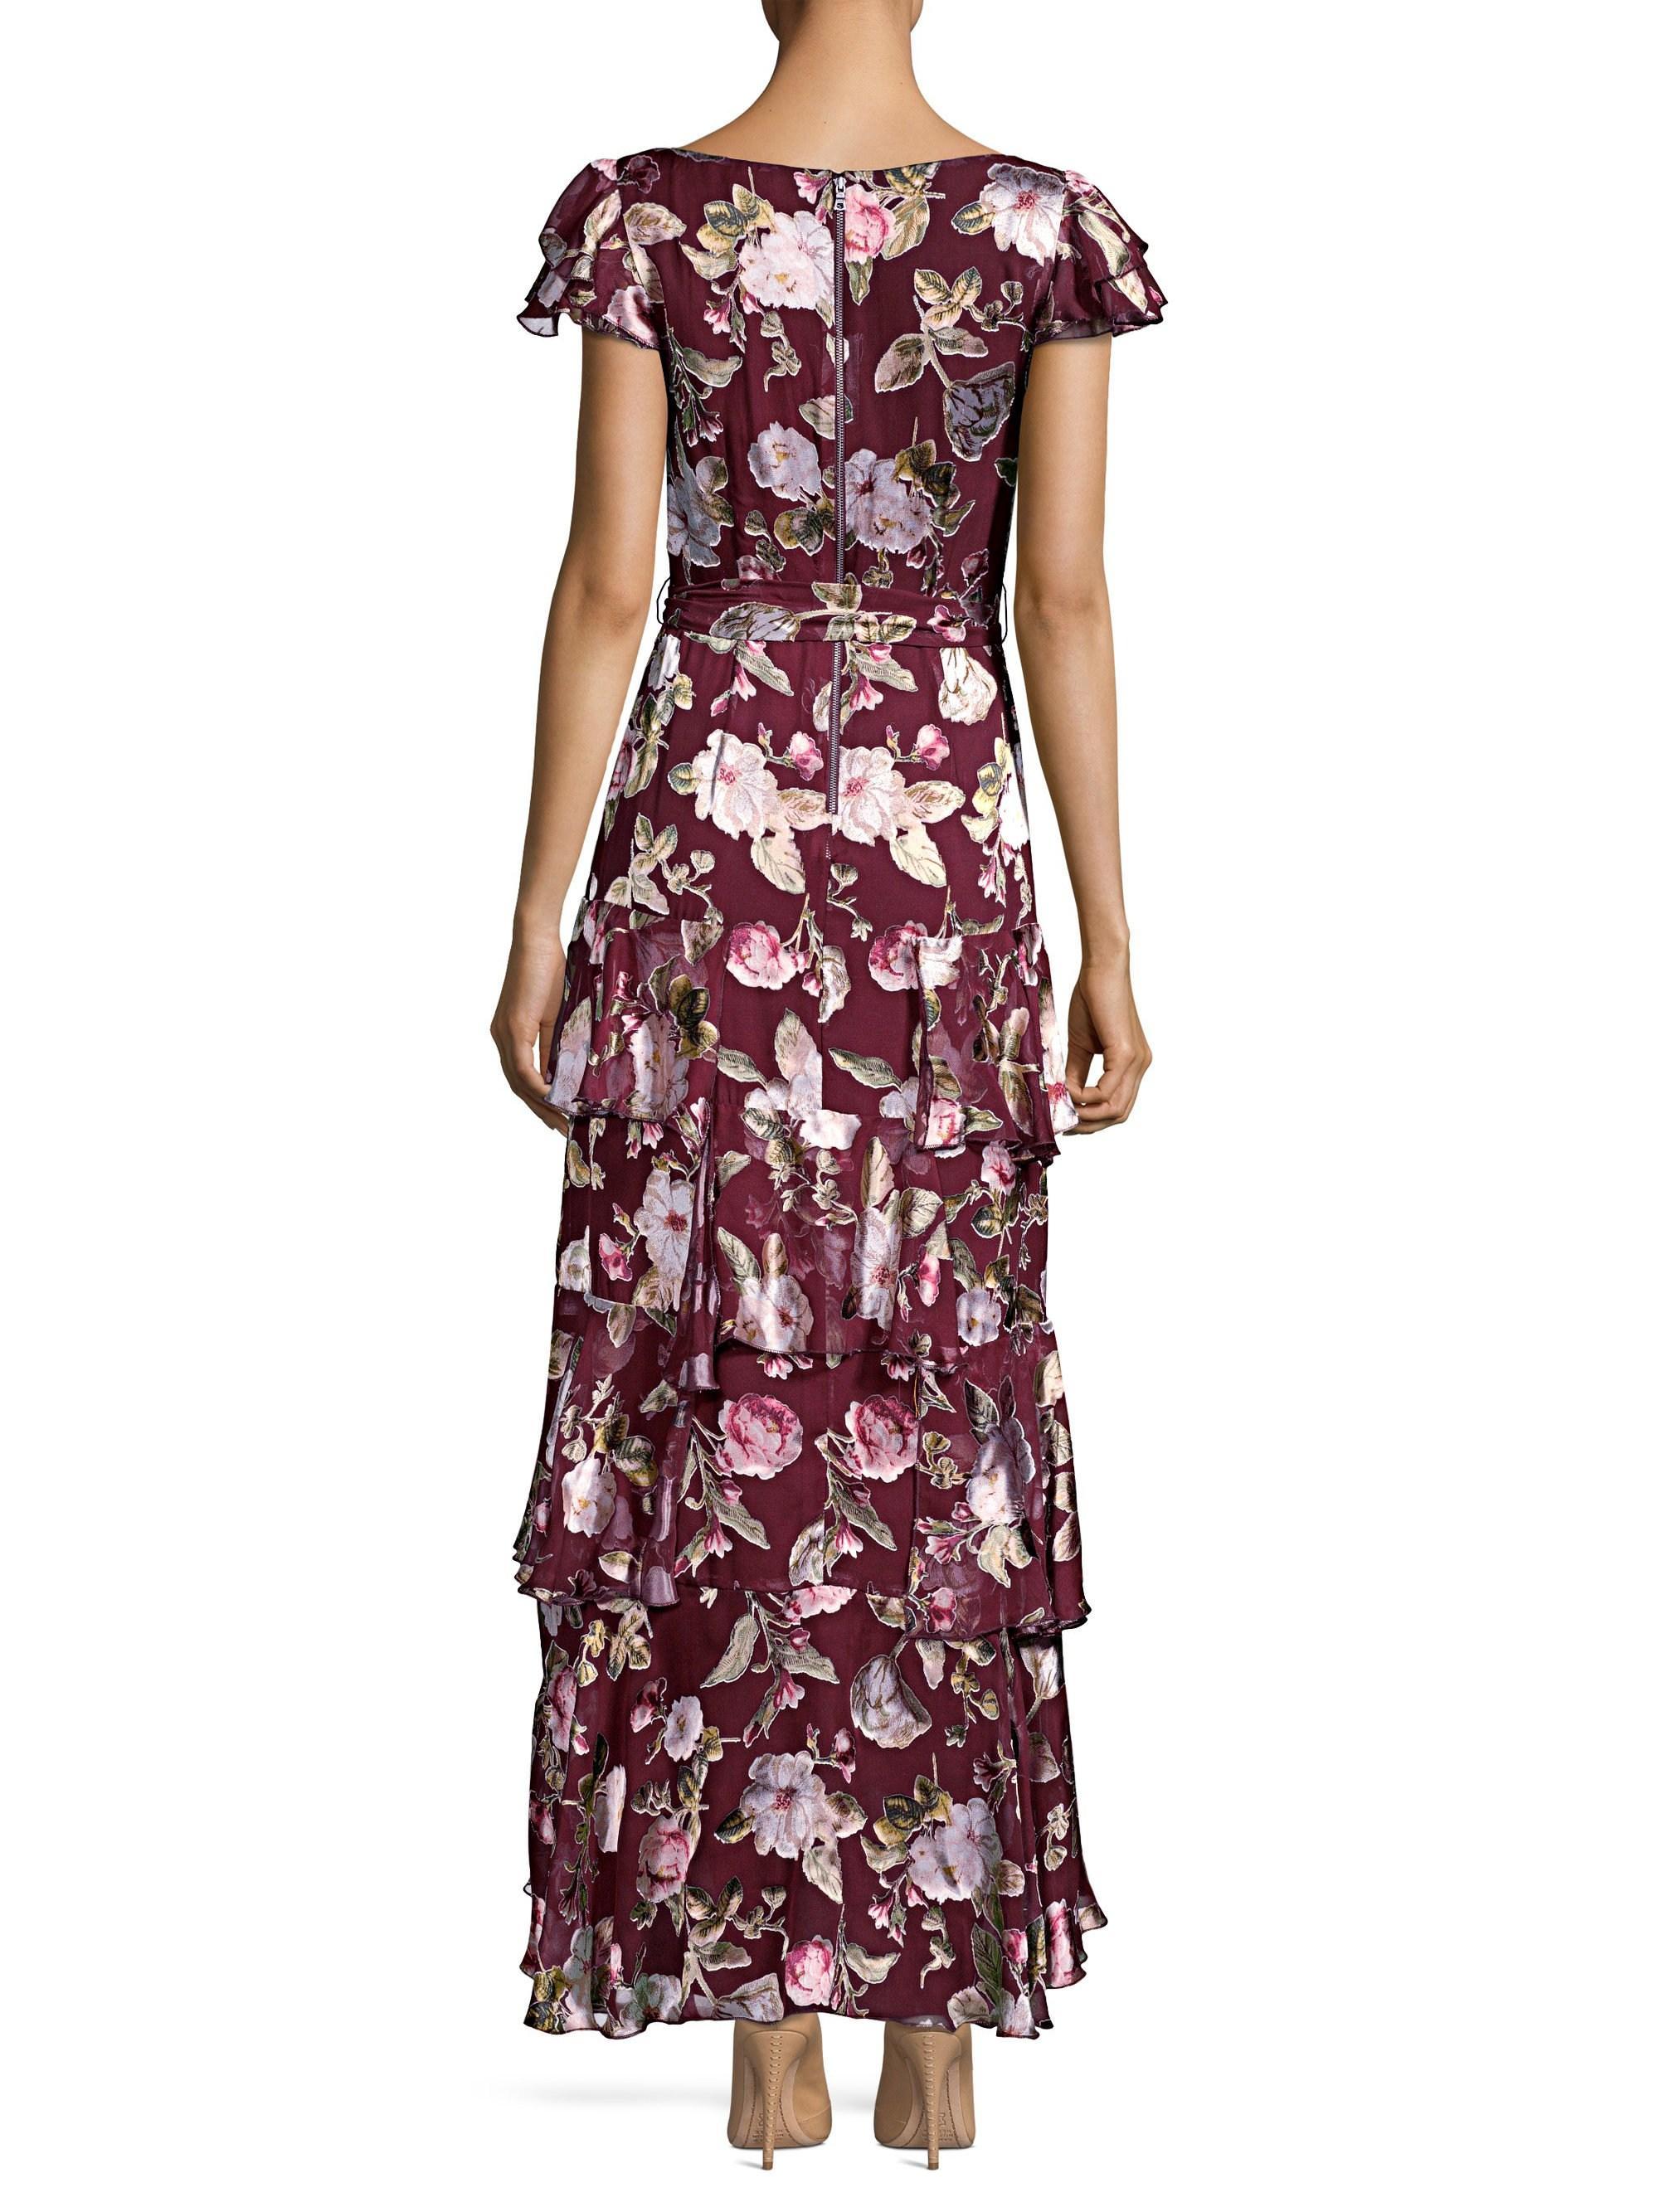 b8012809944f Alice + Olivia Jenny Flutter Sleeve Ruffle Dress - Lyst